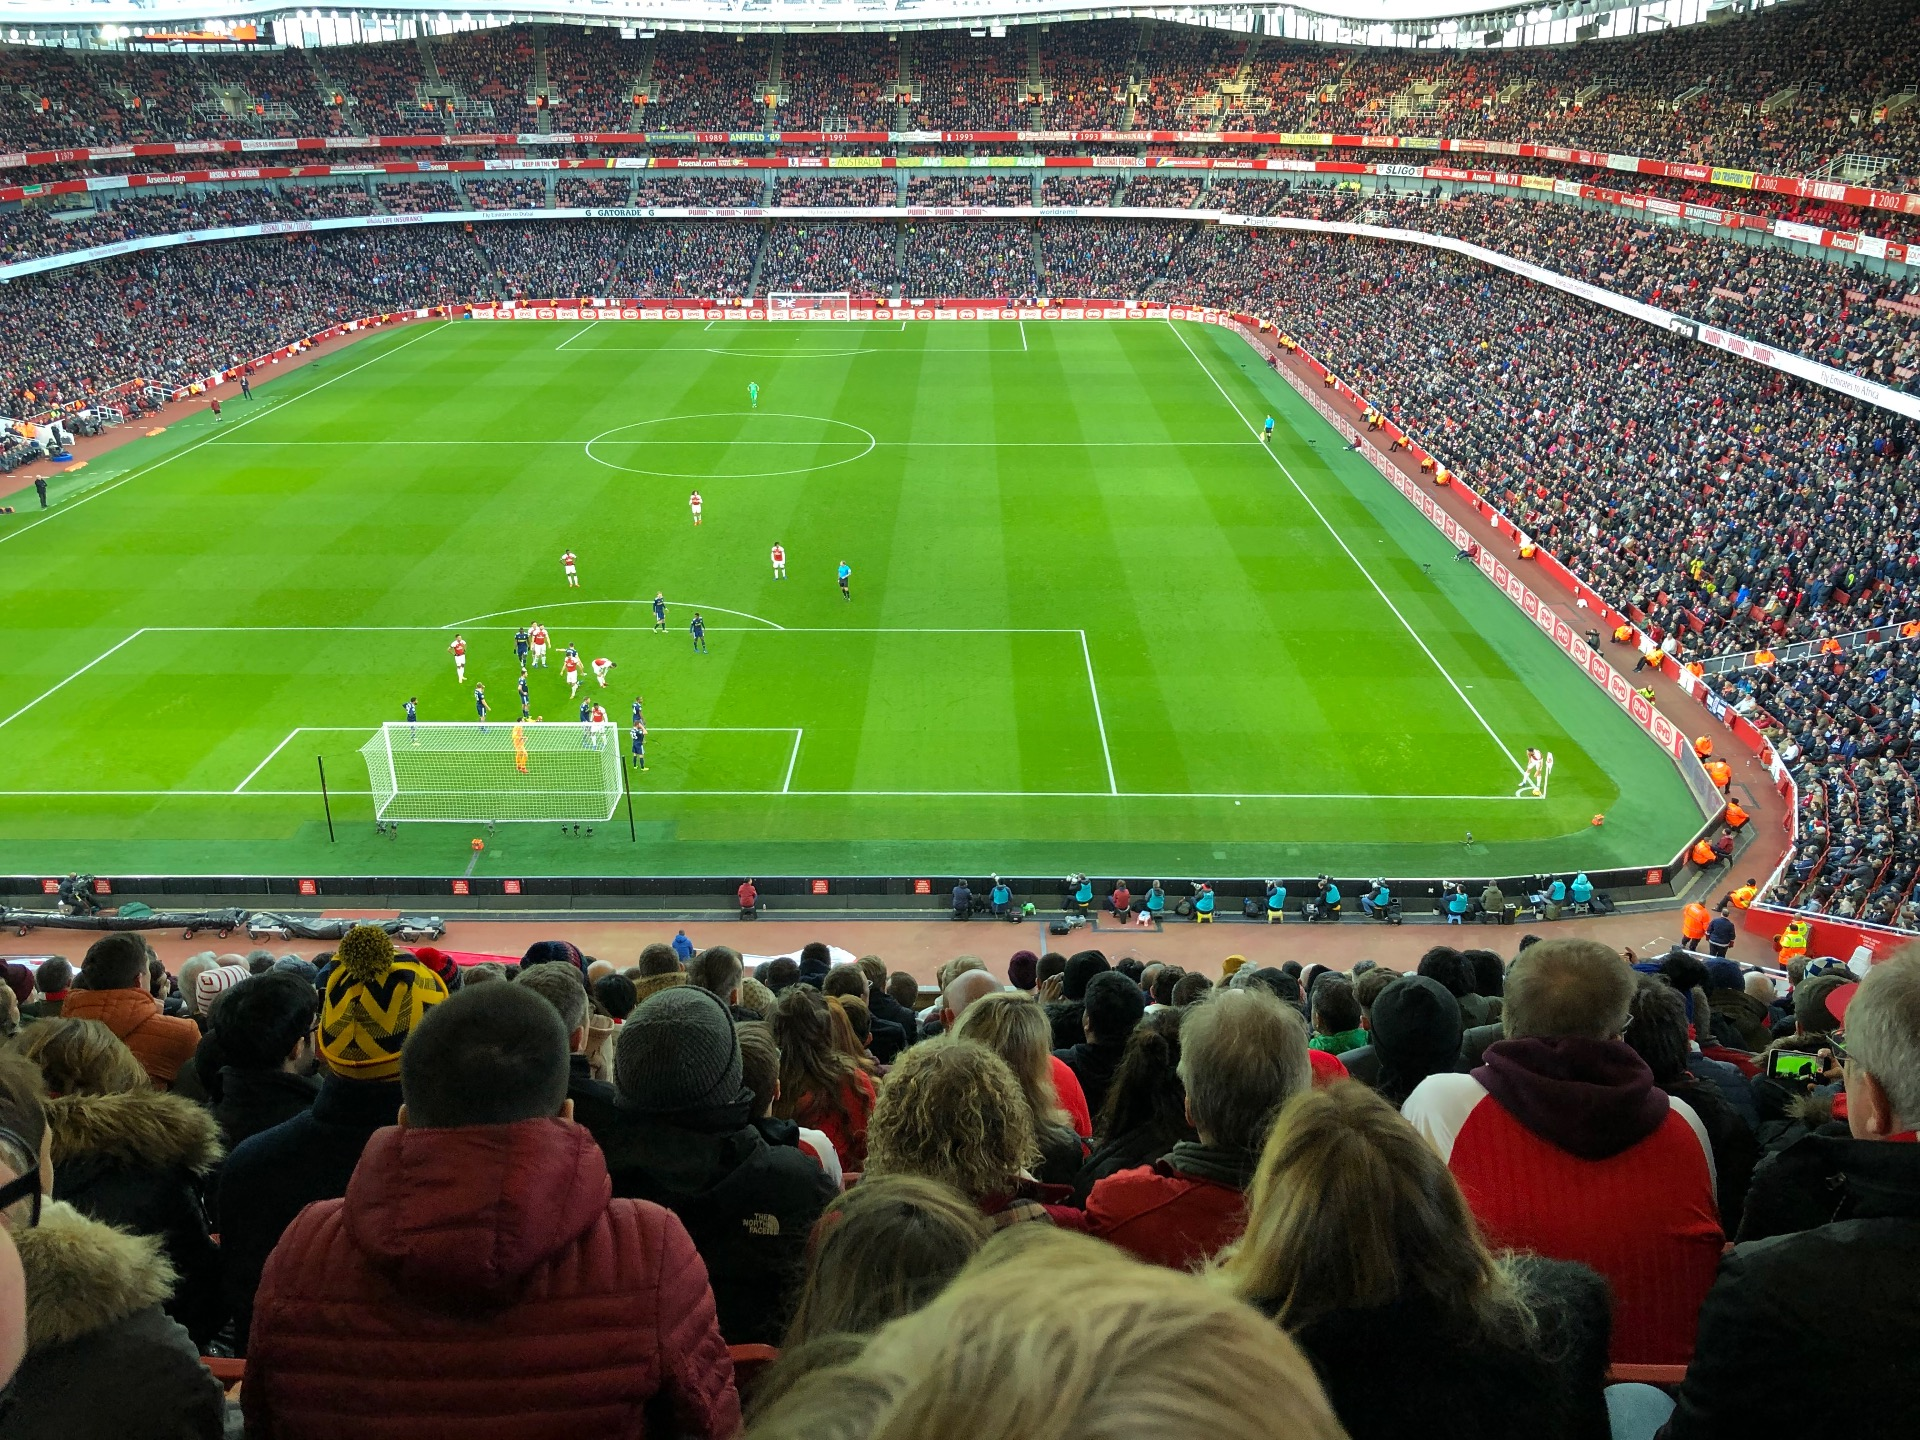 Emirates Stadium Section 123 Row 14 Seat 880